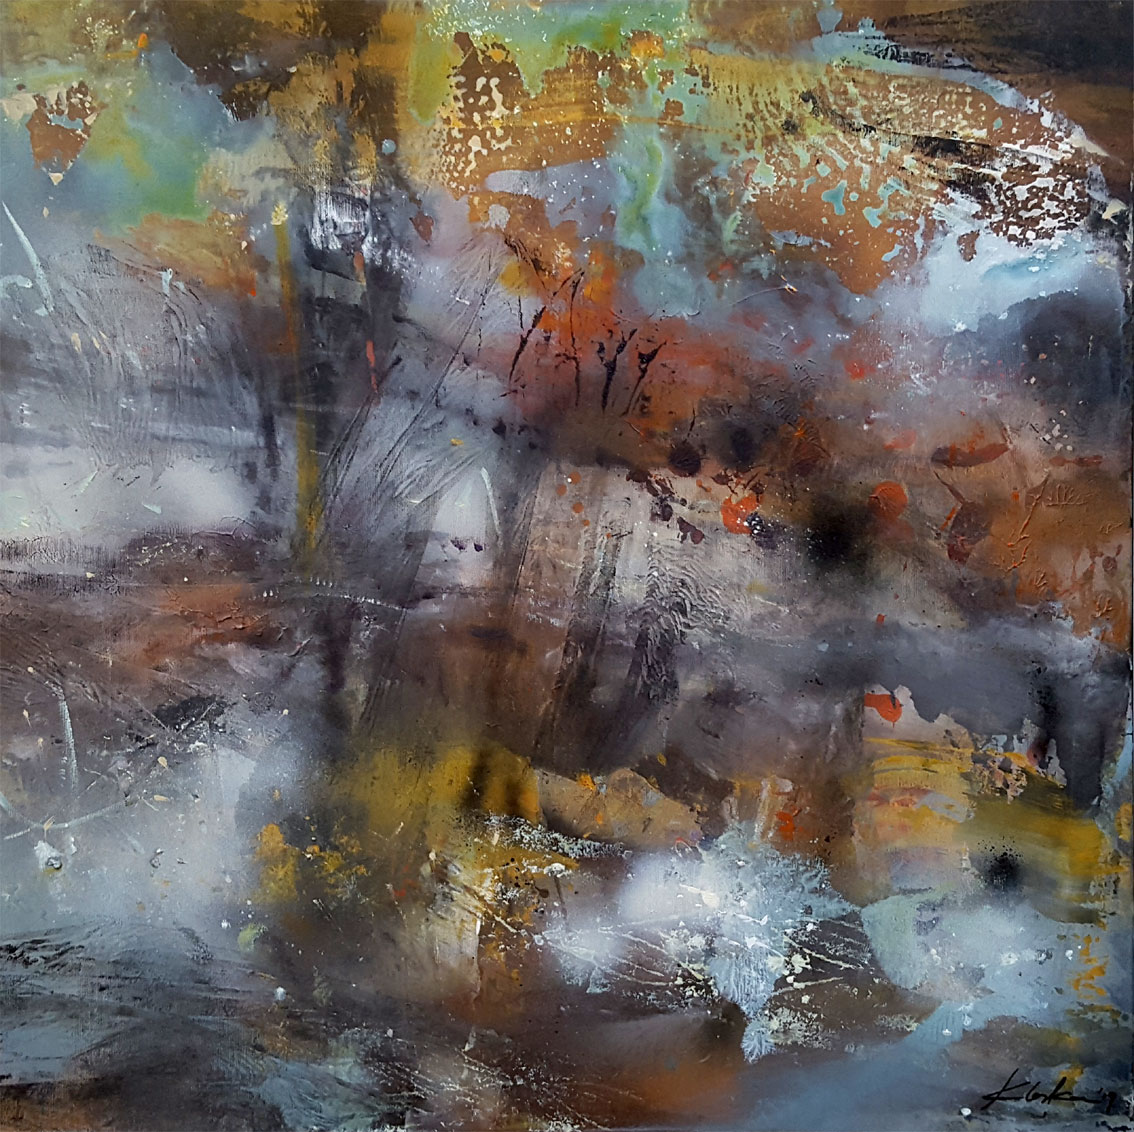 Large framed diaphane painting mindscape lightscape sonata for a deep silence by O KLOSKA